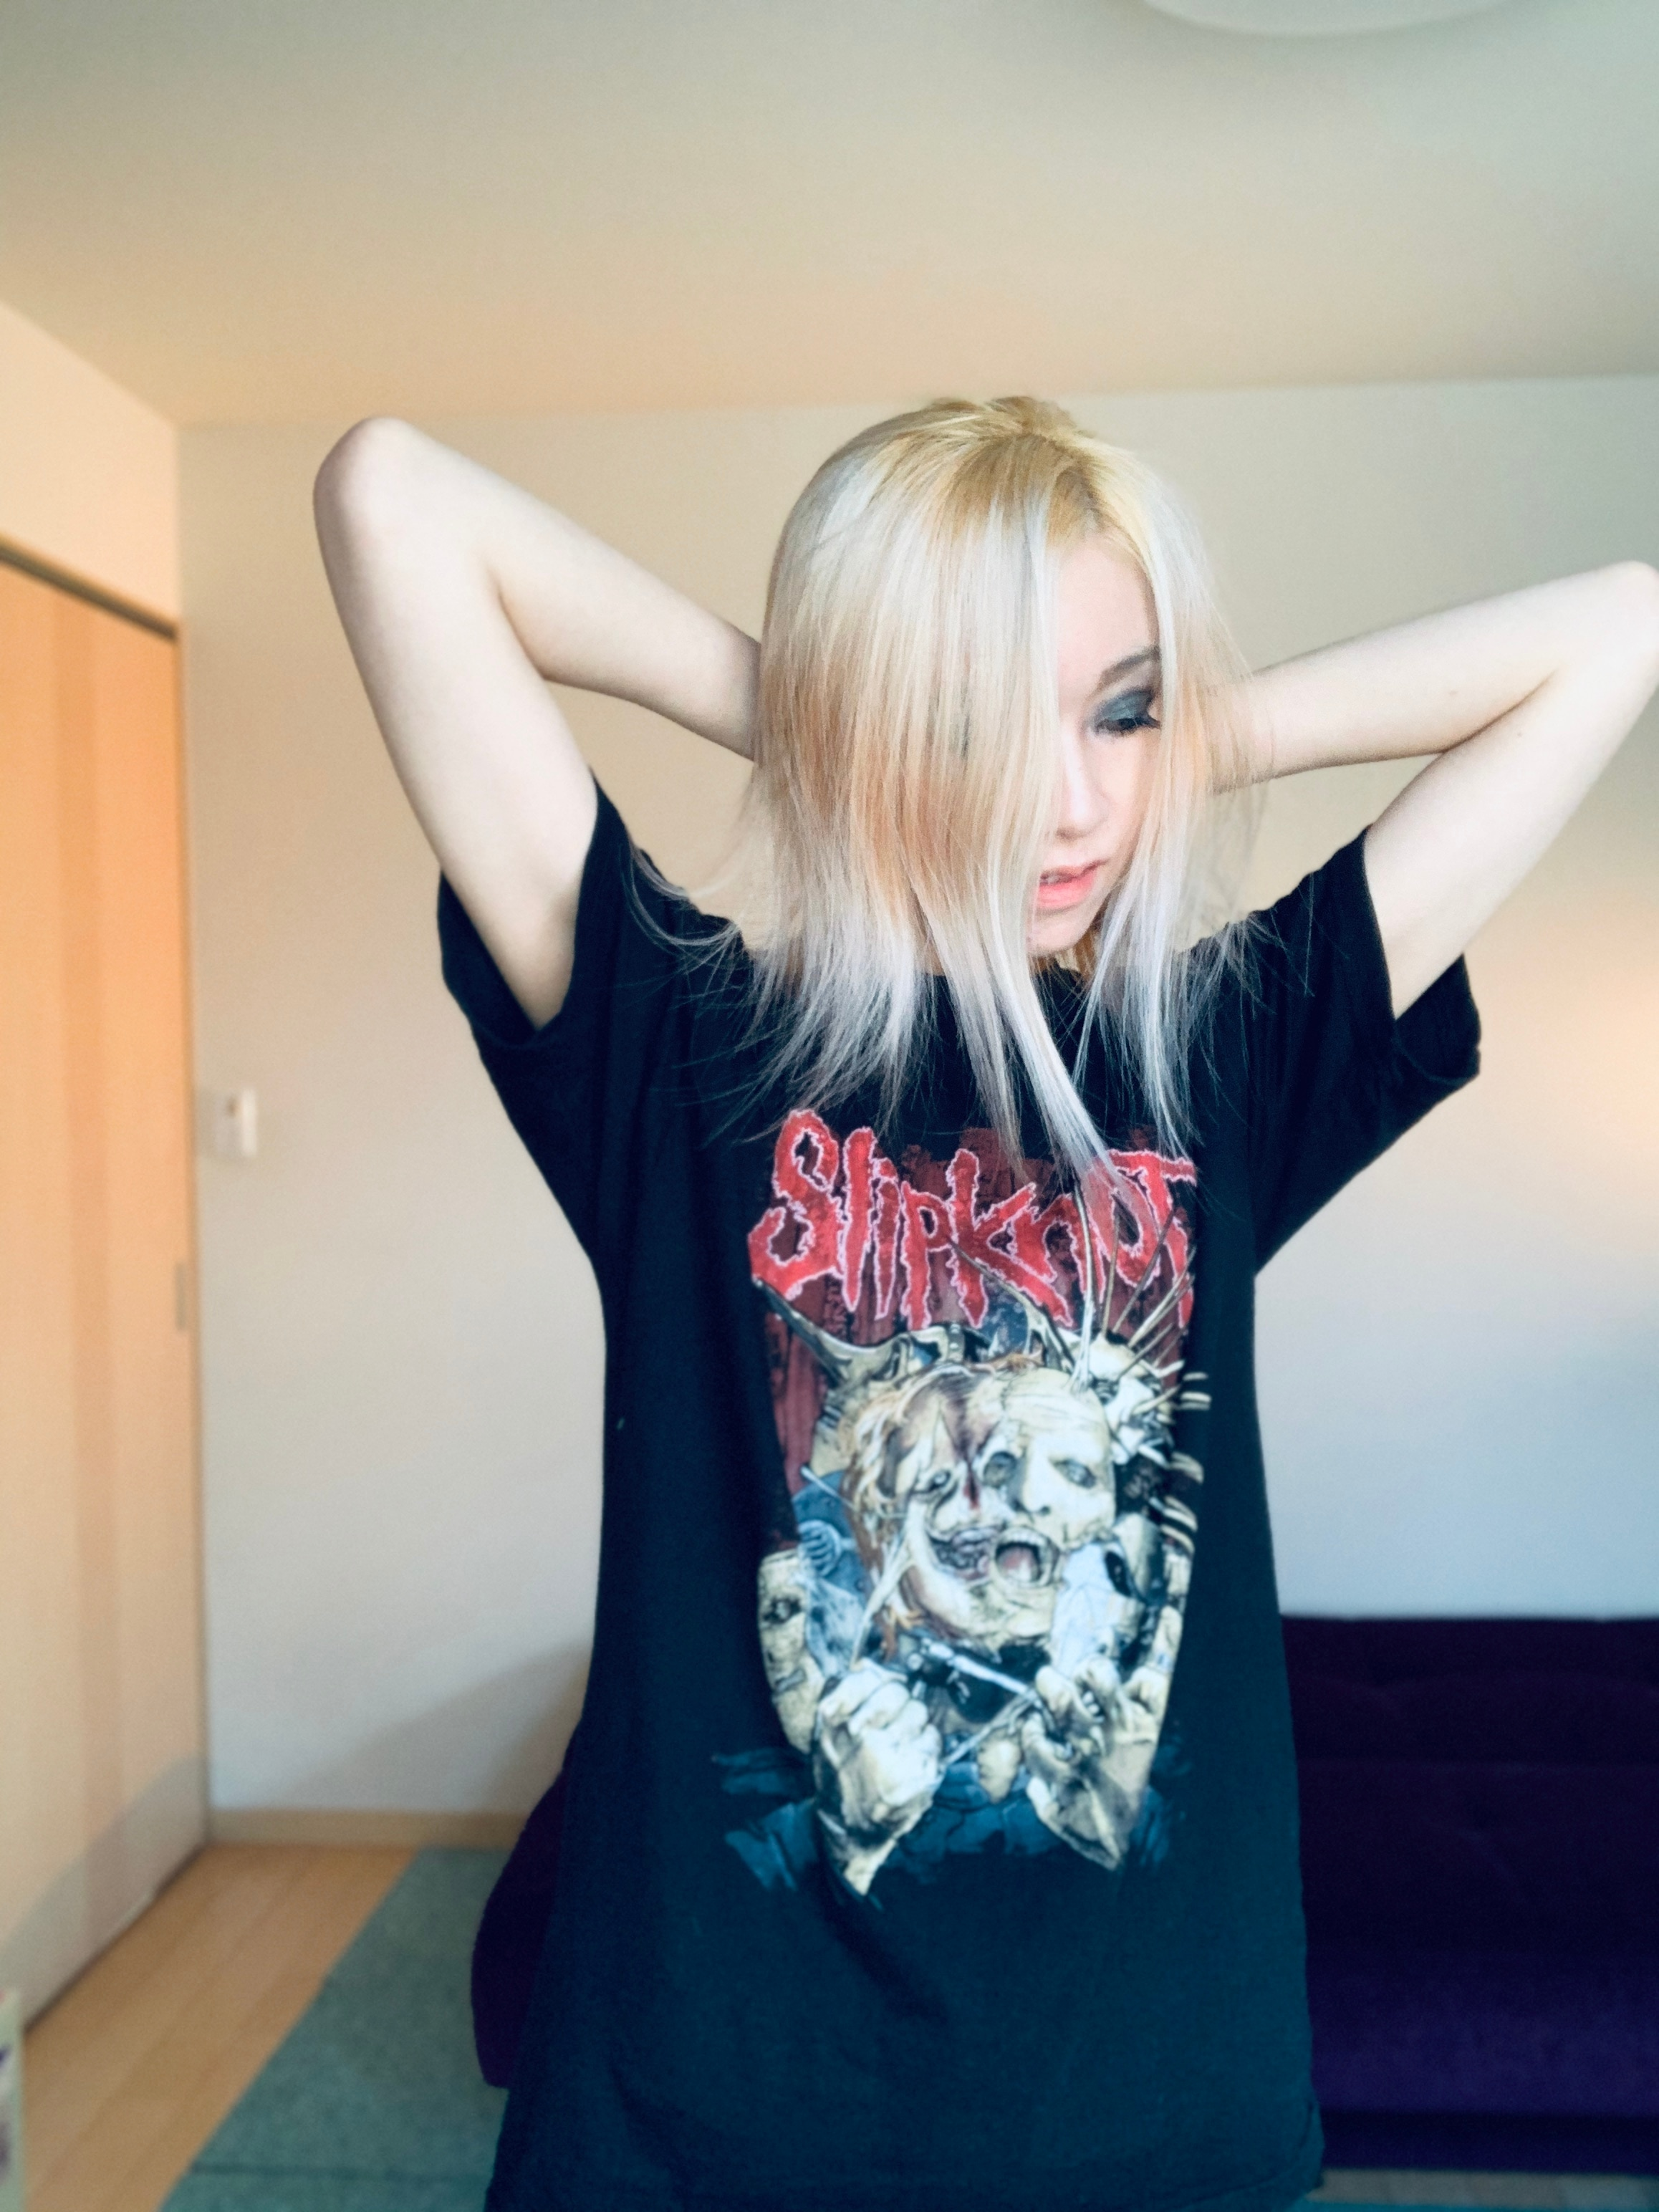 Yui Drahos様のSLIPKNOT Tシャツ着こなし